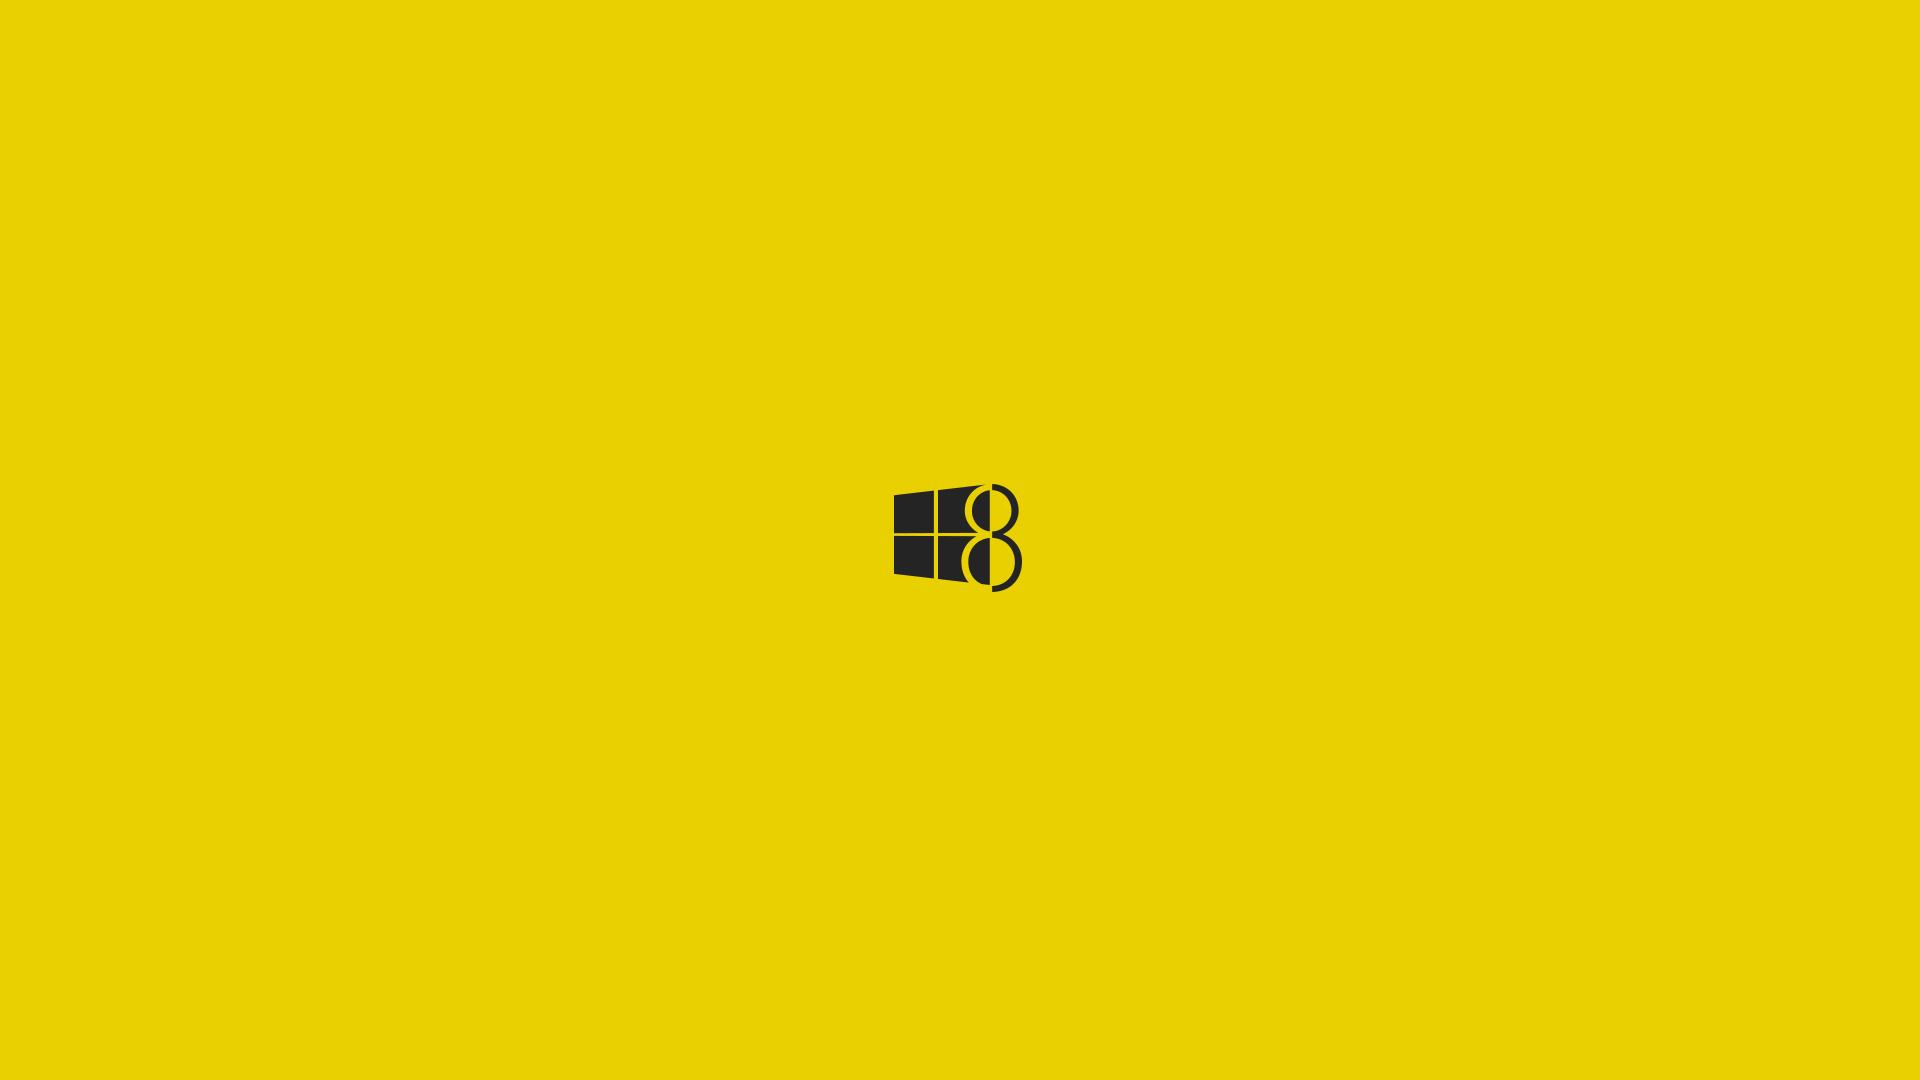 Windows 8 Black Yellow Nt Green Illustration 1091226